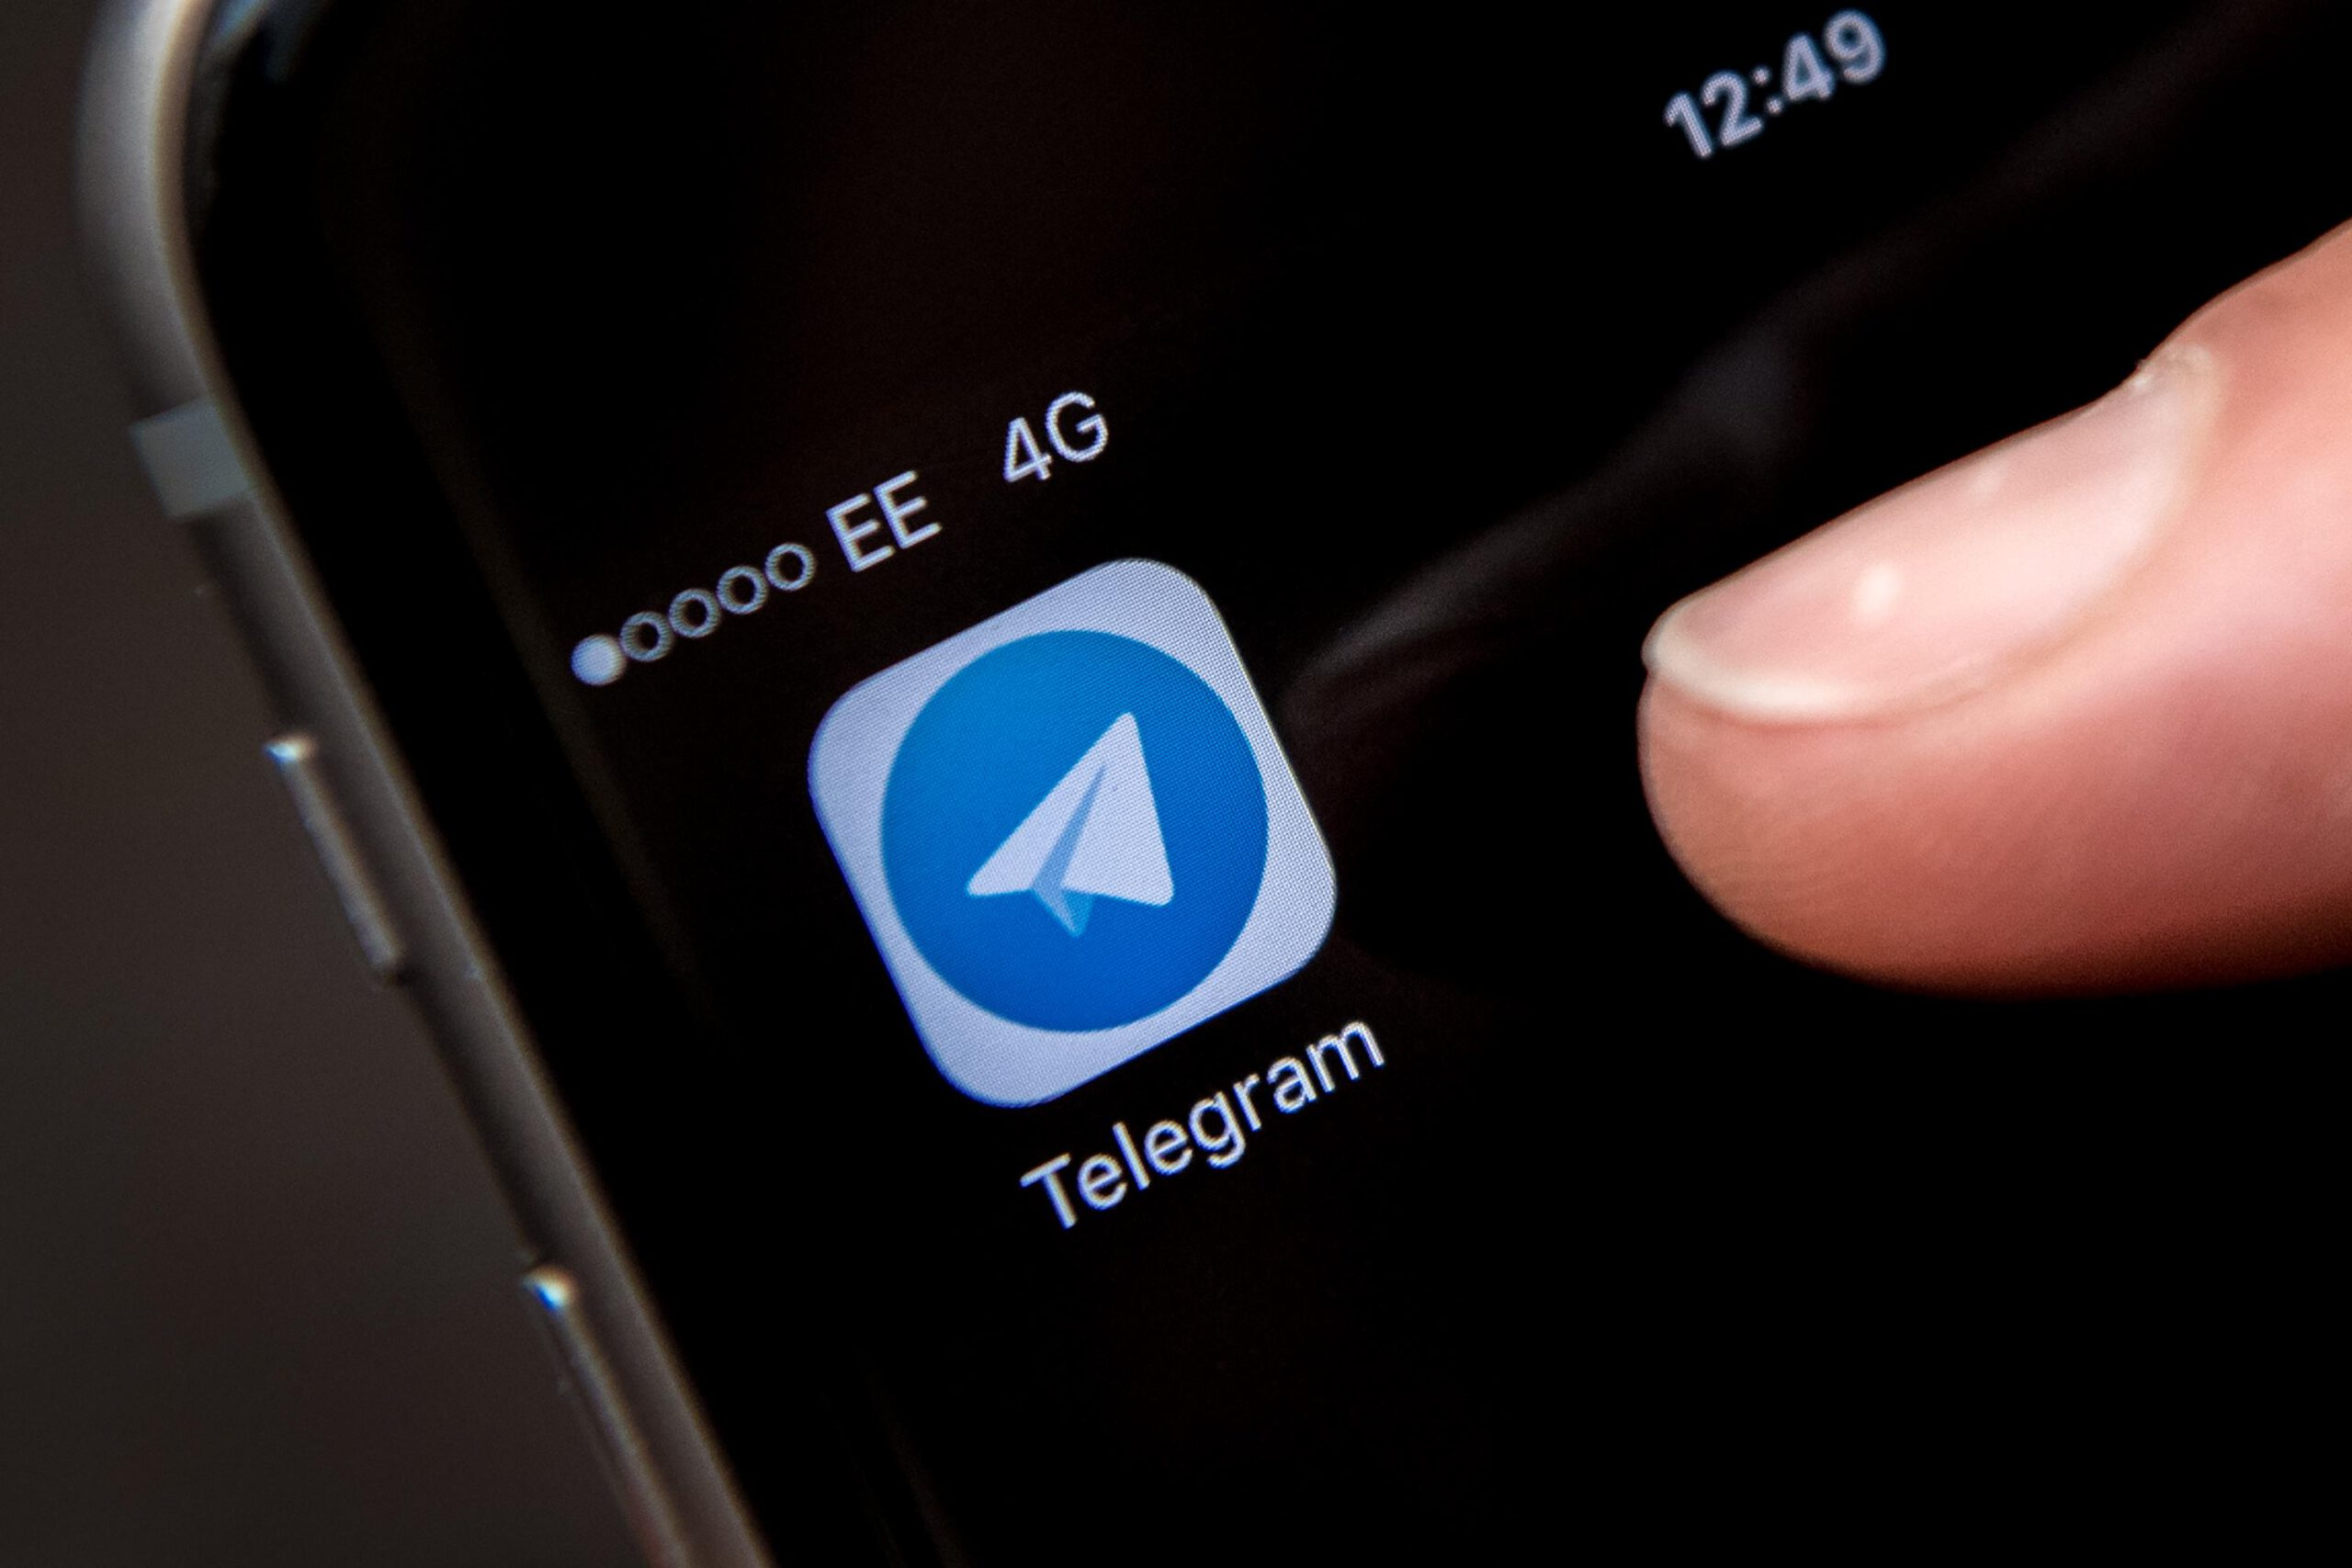 نرم افزار تلگرام